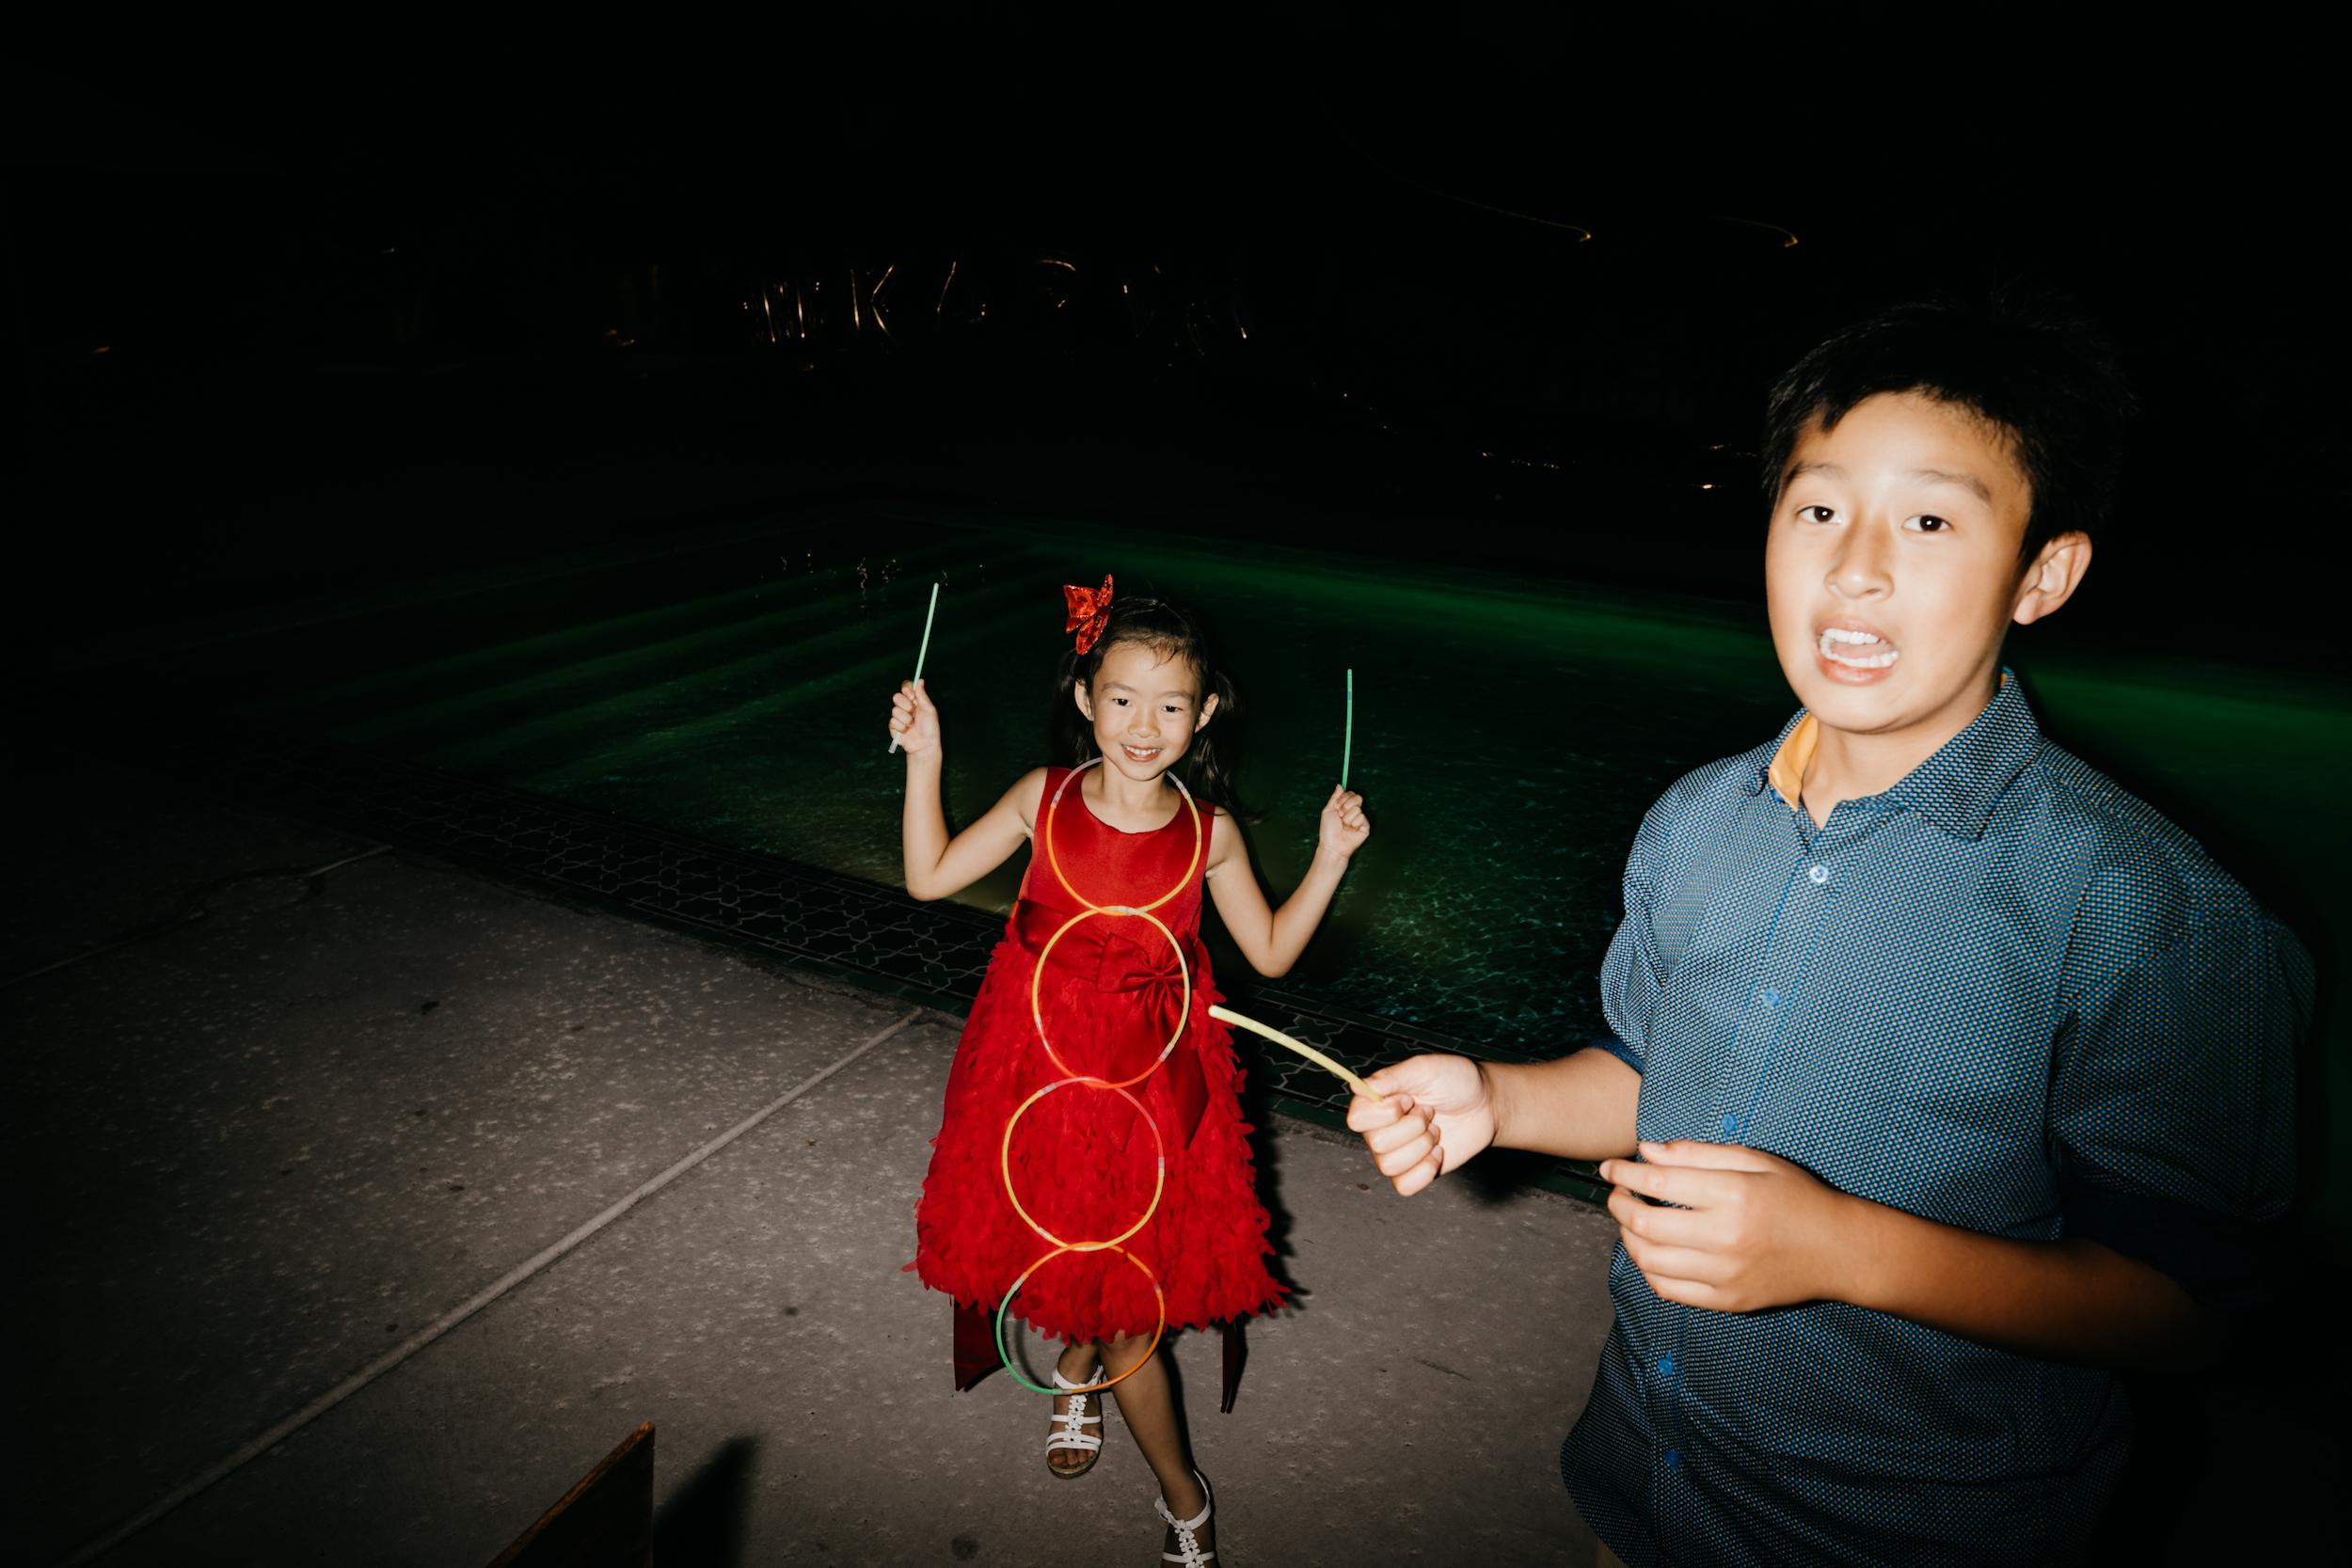 palm-springs-wedding-photography891.jpg